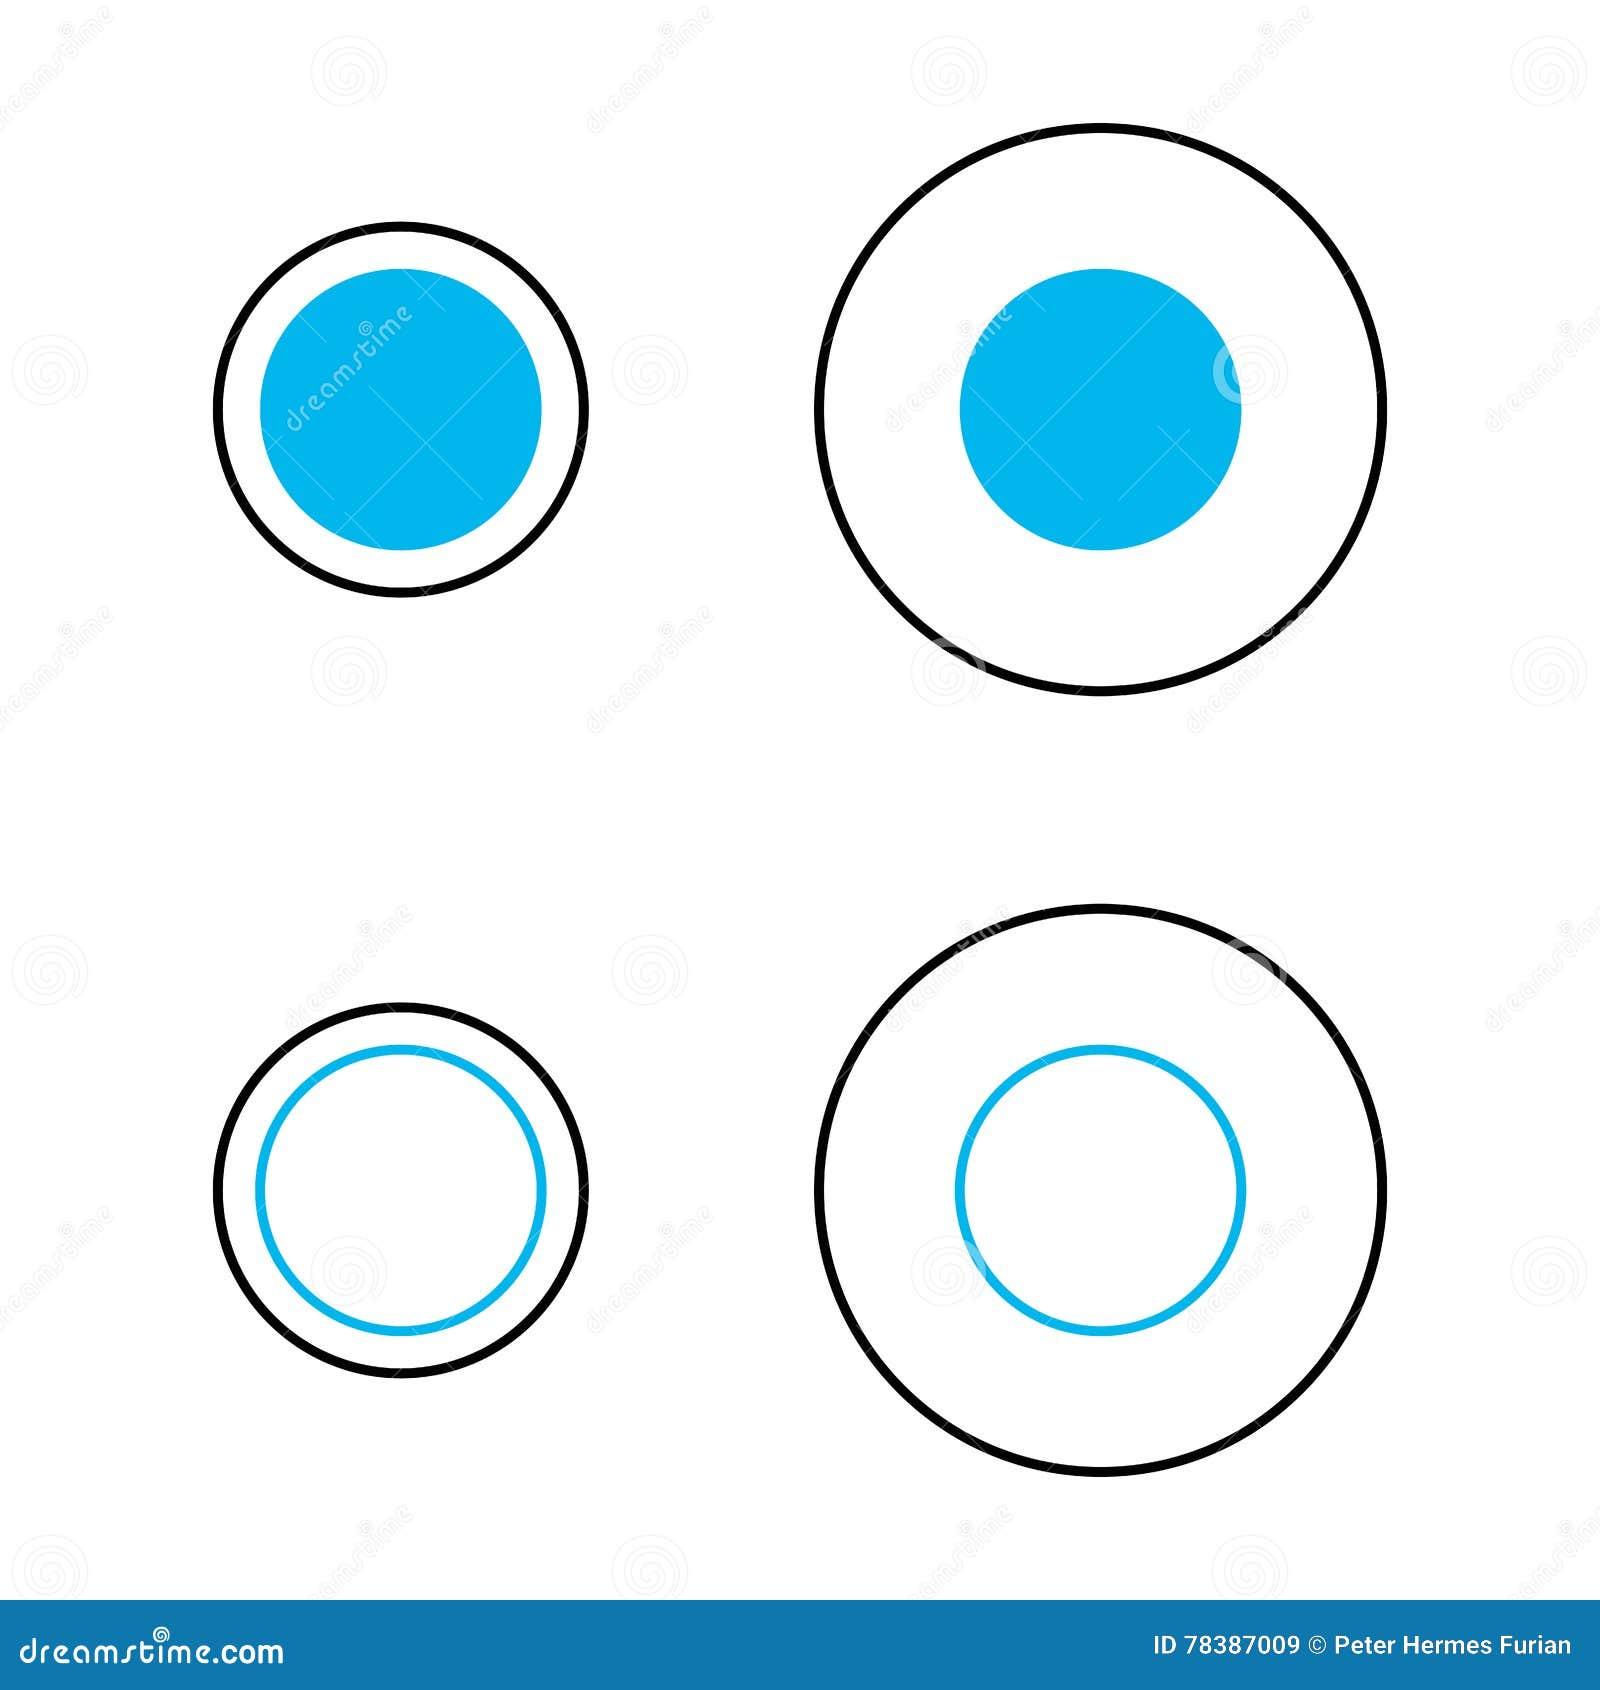 Delboeuf Optical Illusion Of Relative Size Perception ...  Delboeuf Optica...